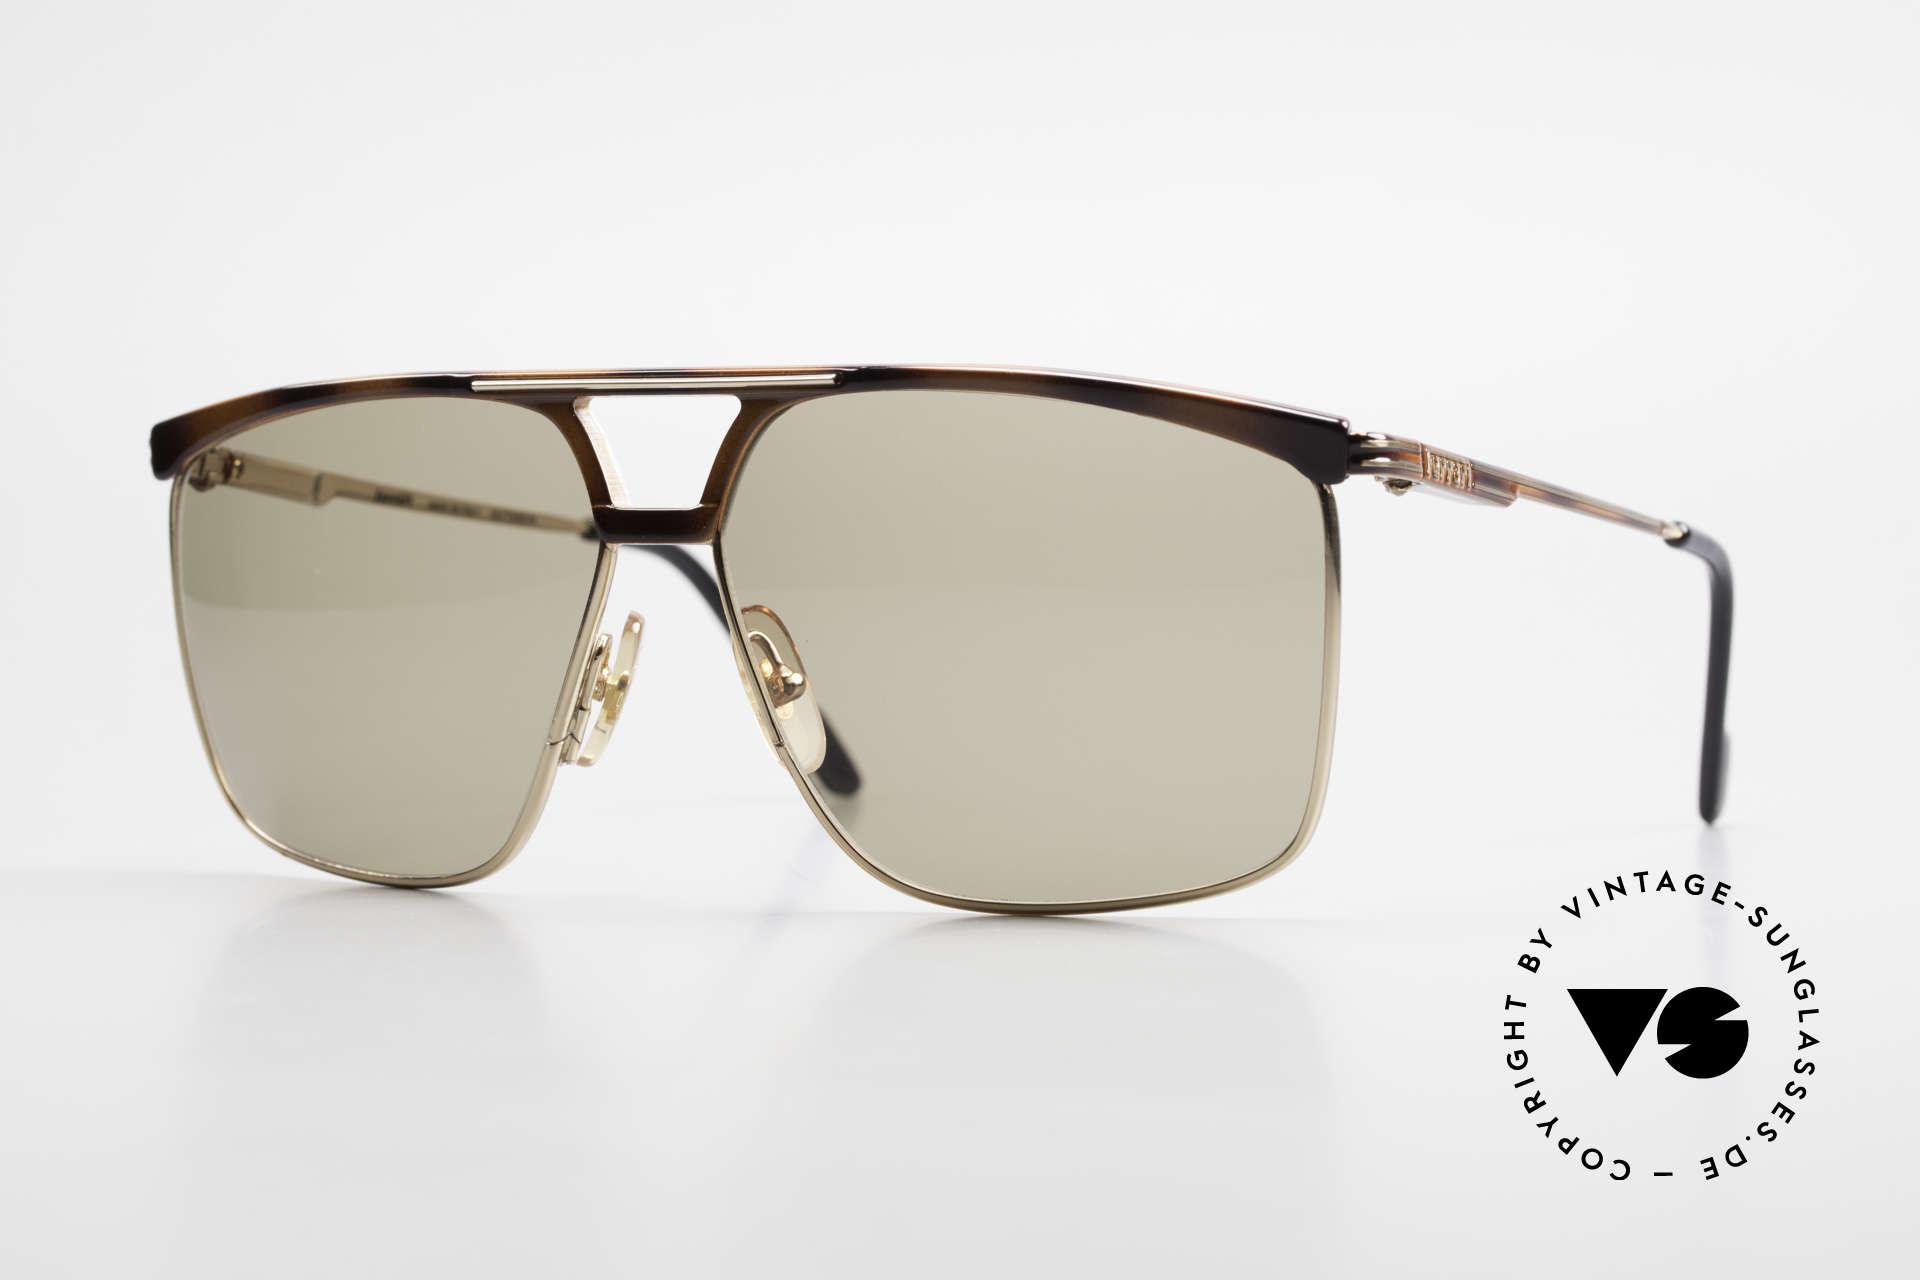 Ferrari F35 X-Large Sunglasses Alutanium, very masculine Ferrari FORMULA 1 vintage sunglasses, Made for Men